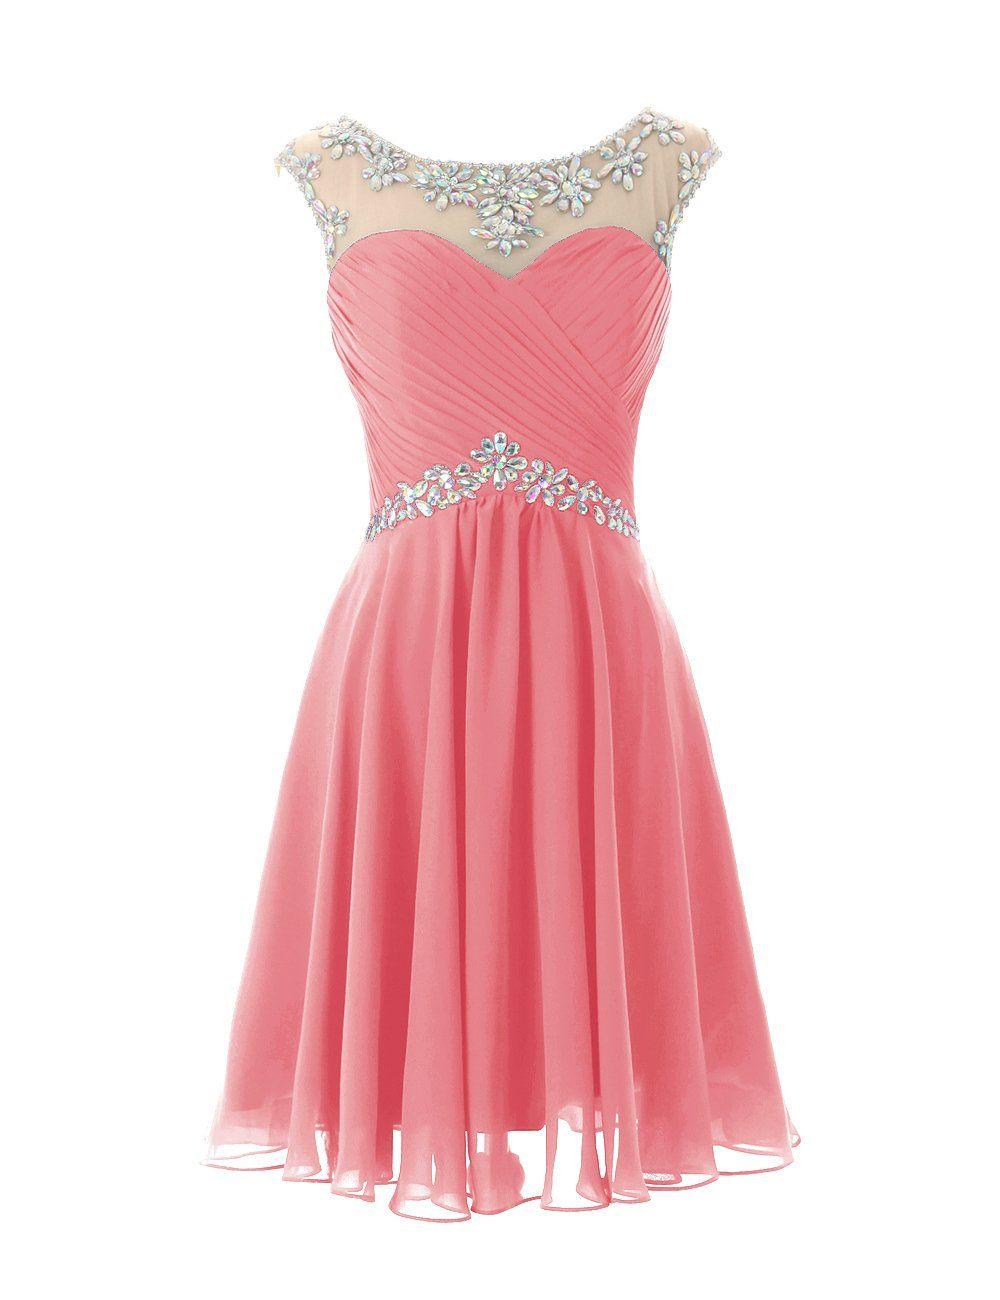 6e170123f0d Dresstells® Short Prom Dresses Sexy Homecoming Dress for Juniors Birthday  Dress at Amazon Women s Clothing store